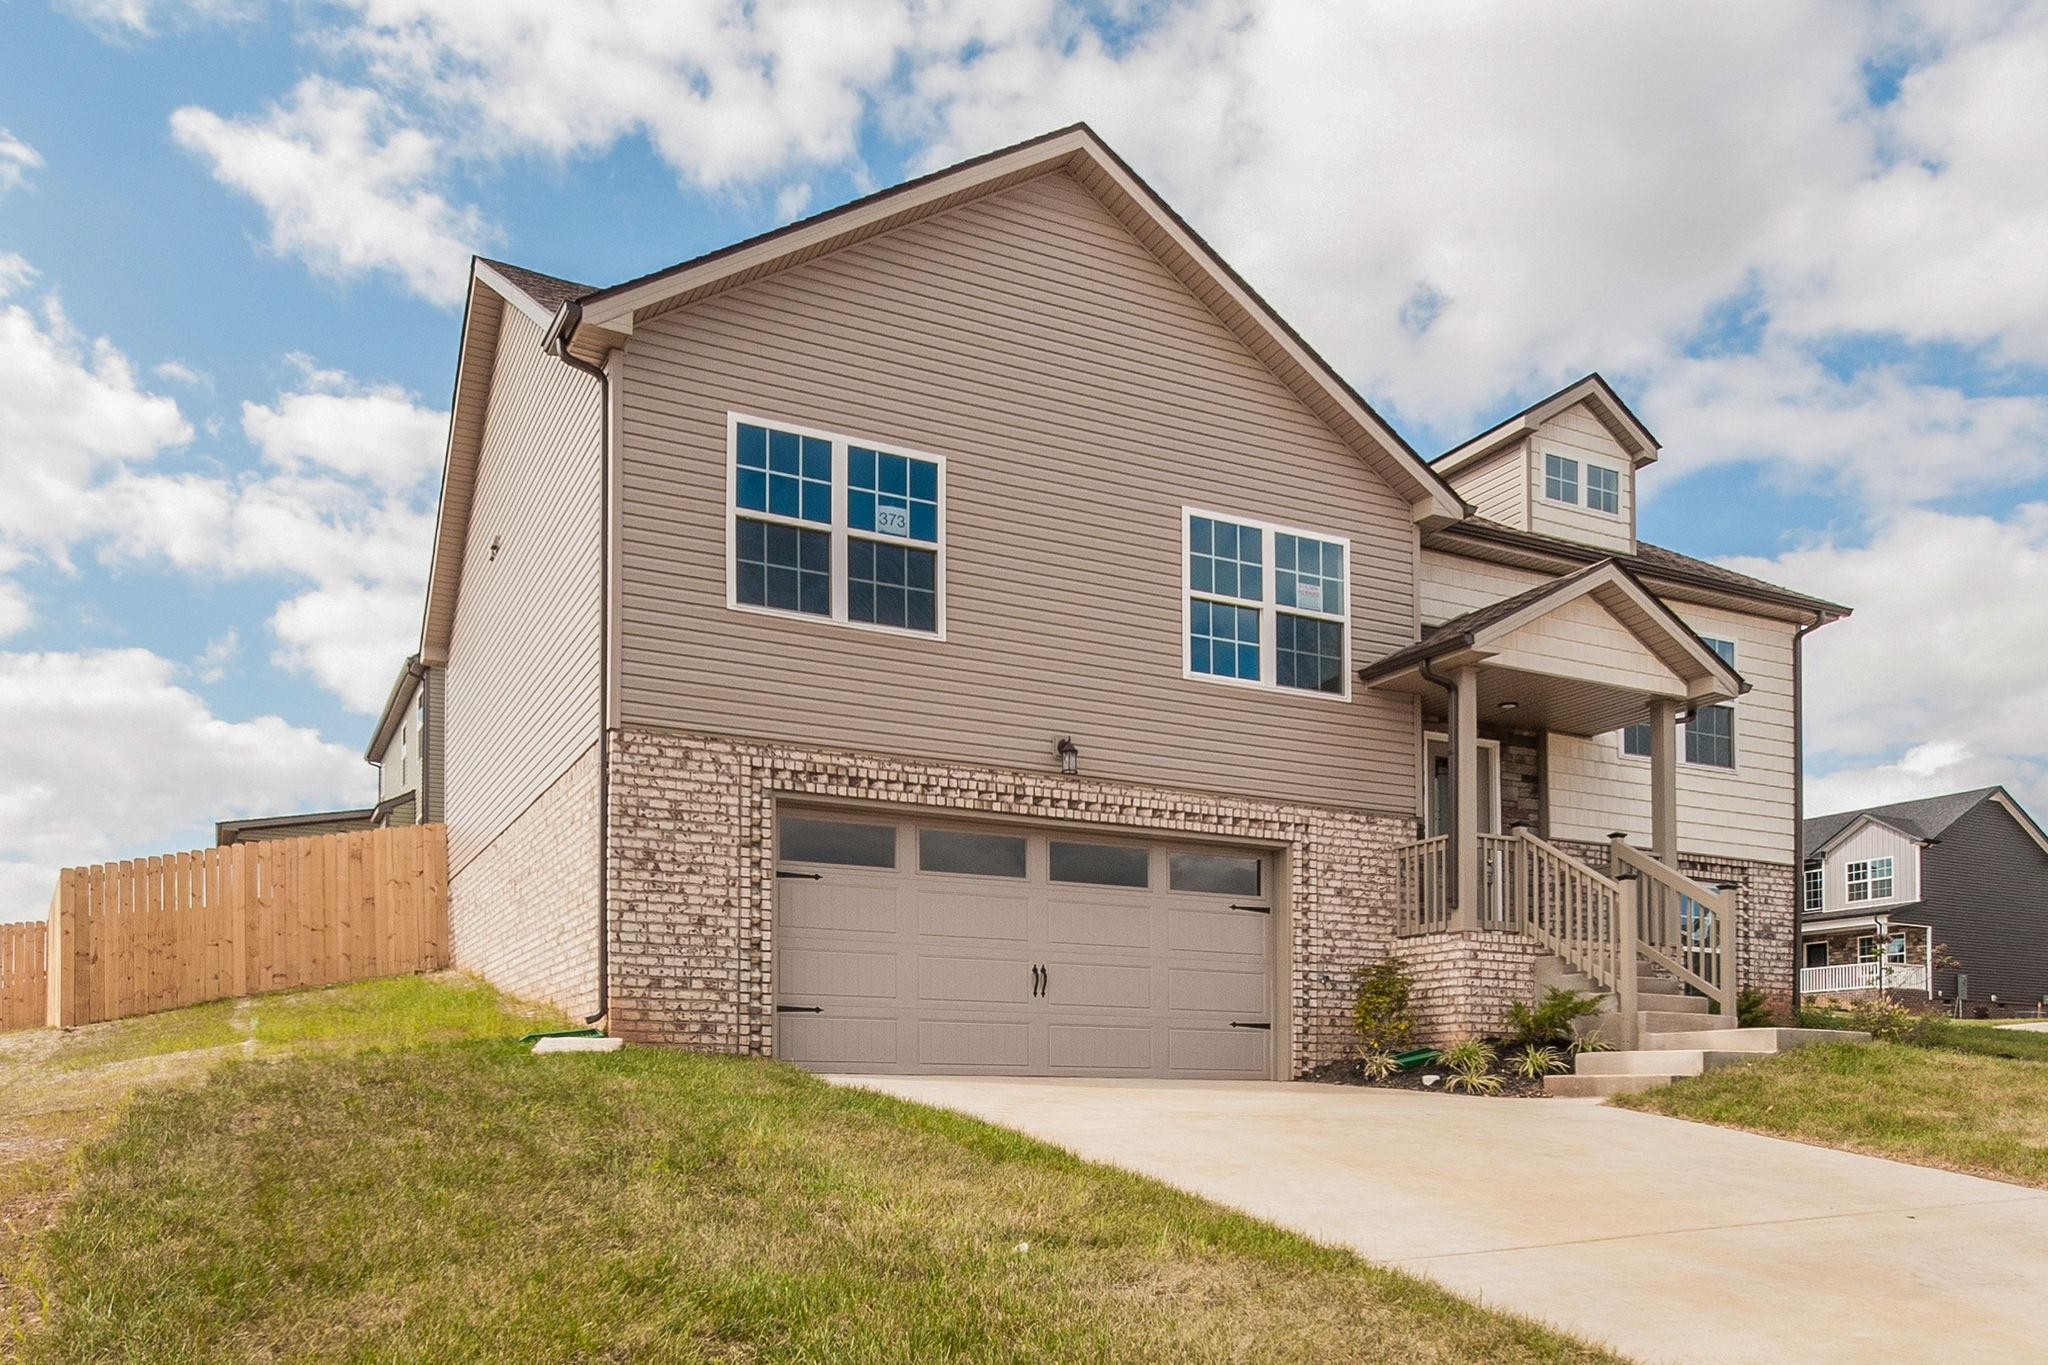 708 Banister Dr (lot 147), Clarksville, TN 37042 - Clarksville, TN real estate listing